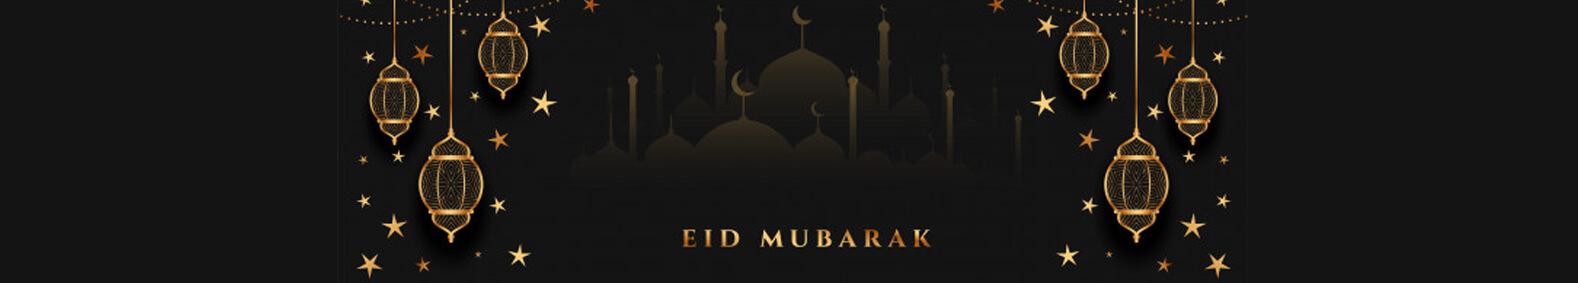 eid collection 2021 sanwarna pk